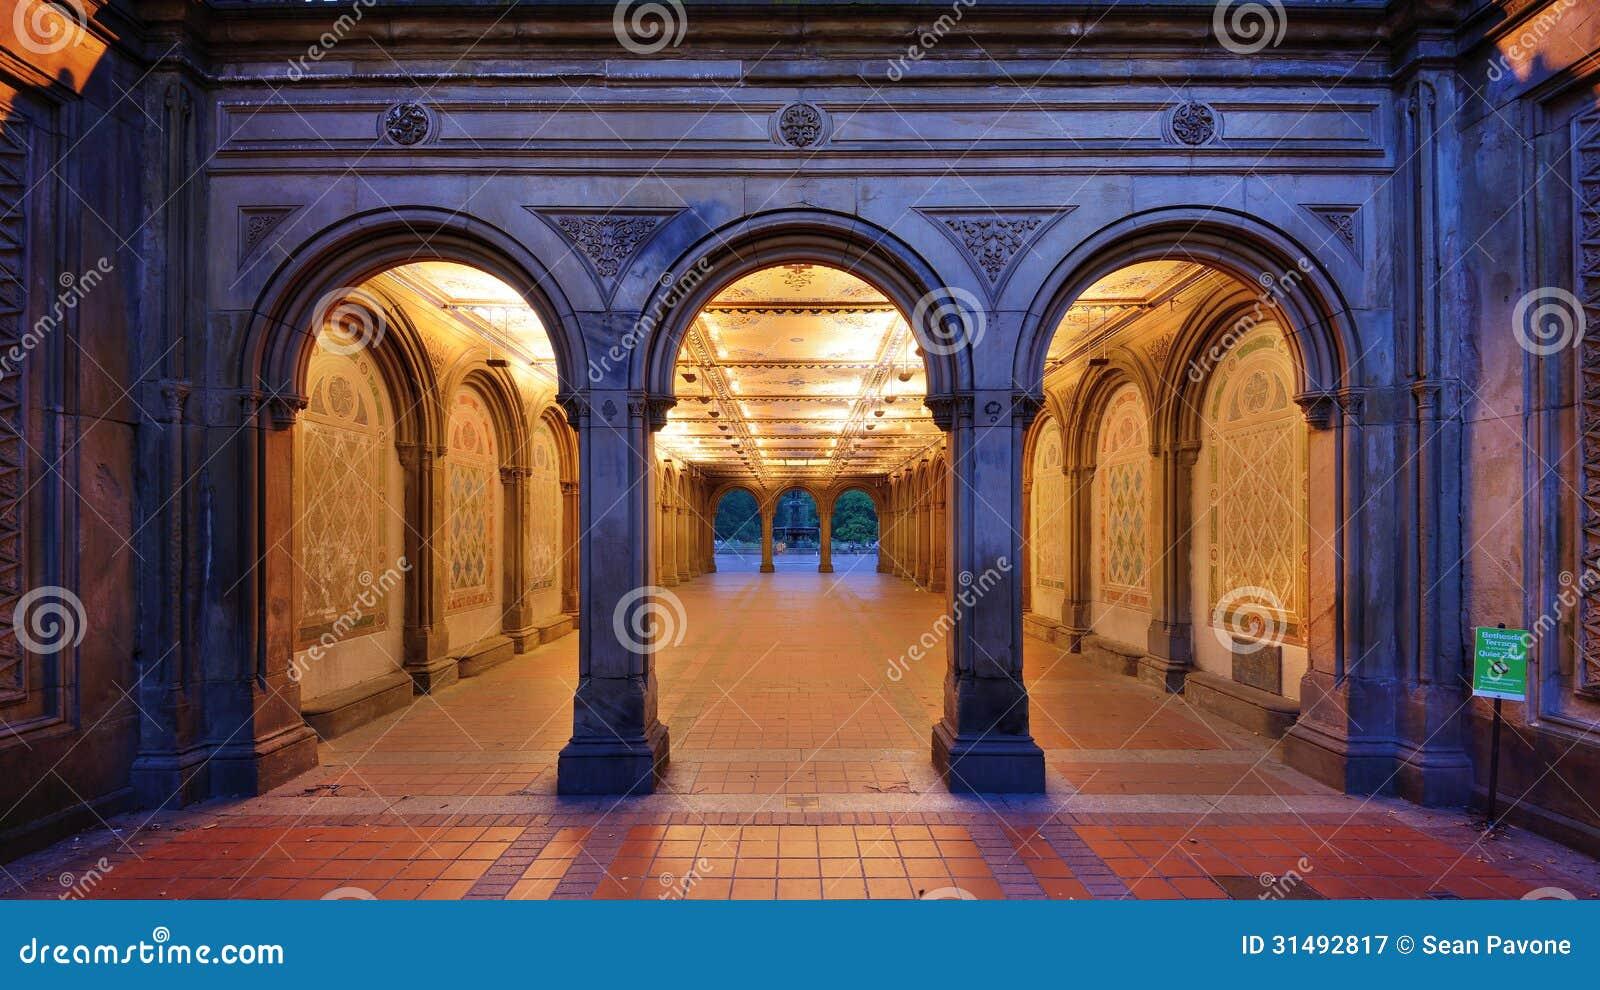 ... pedestrian underpass at Bethesda Terrace, Central Park, New York City